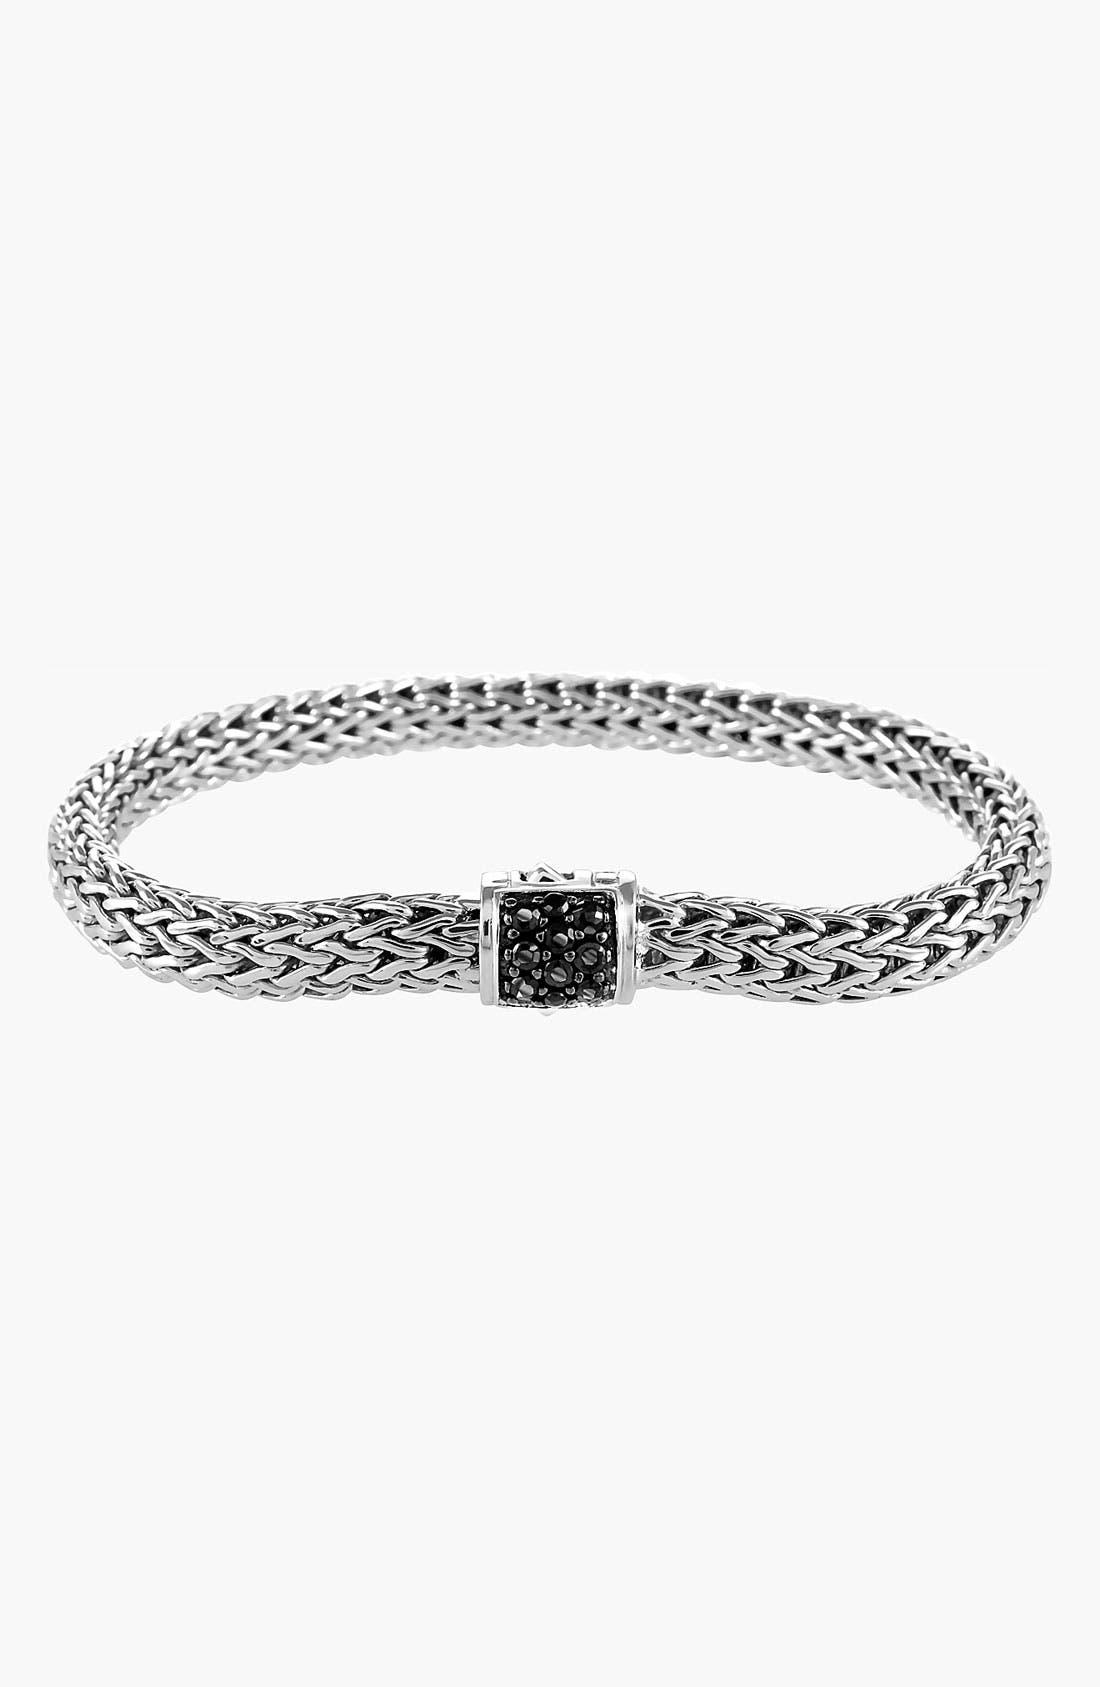 Alternate Image 1 Selected - John Hardy 'Classic Chain' Bracelet